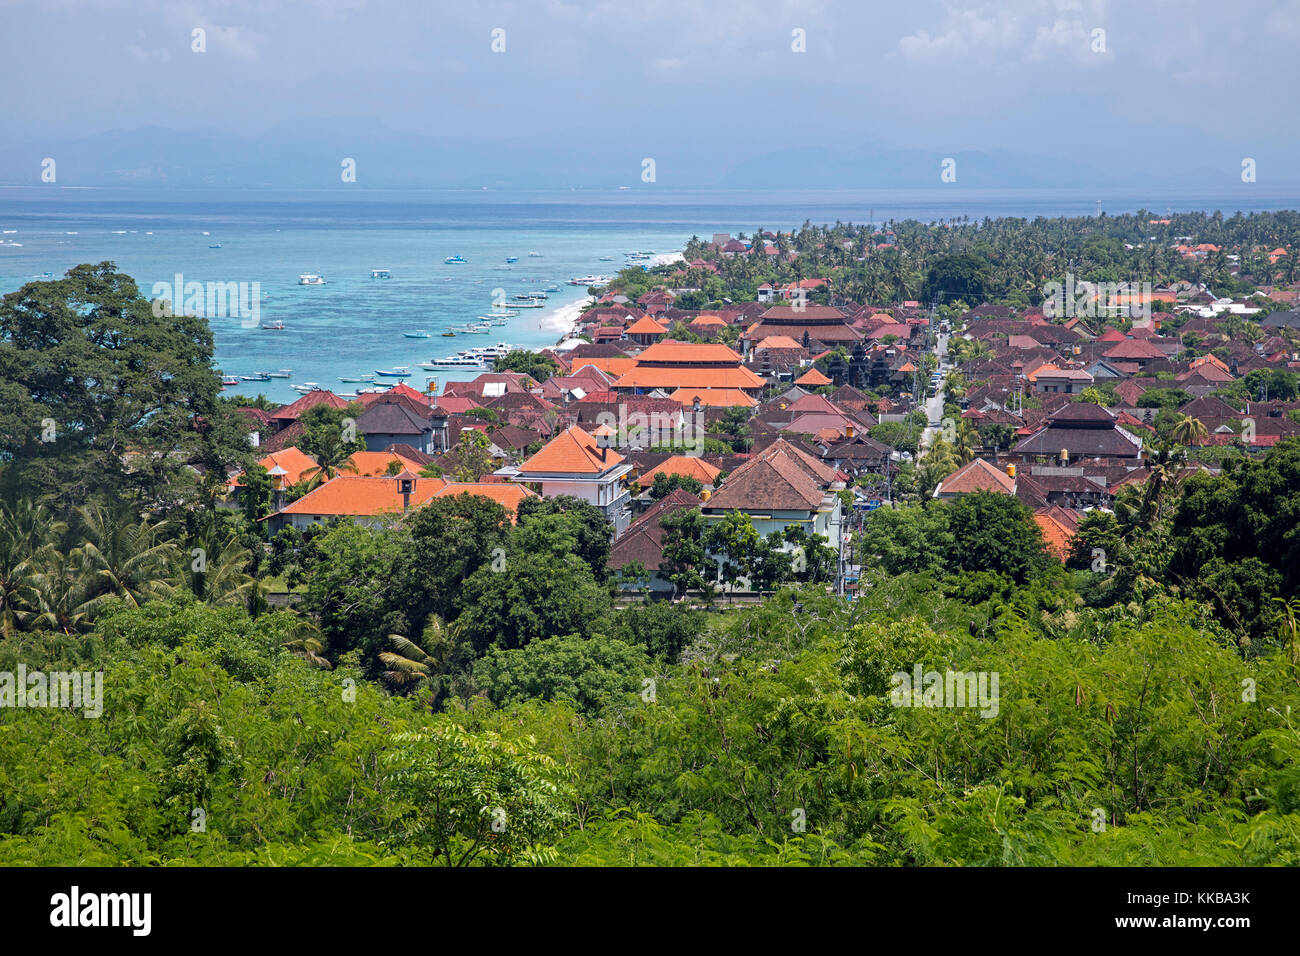 Aerial View Over The Coastal Village Jungut Batu Jungutbatu On The Stock Photo Alamy